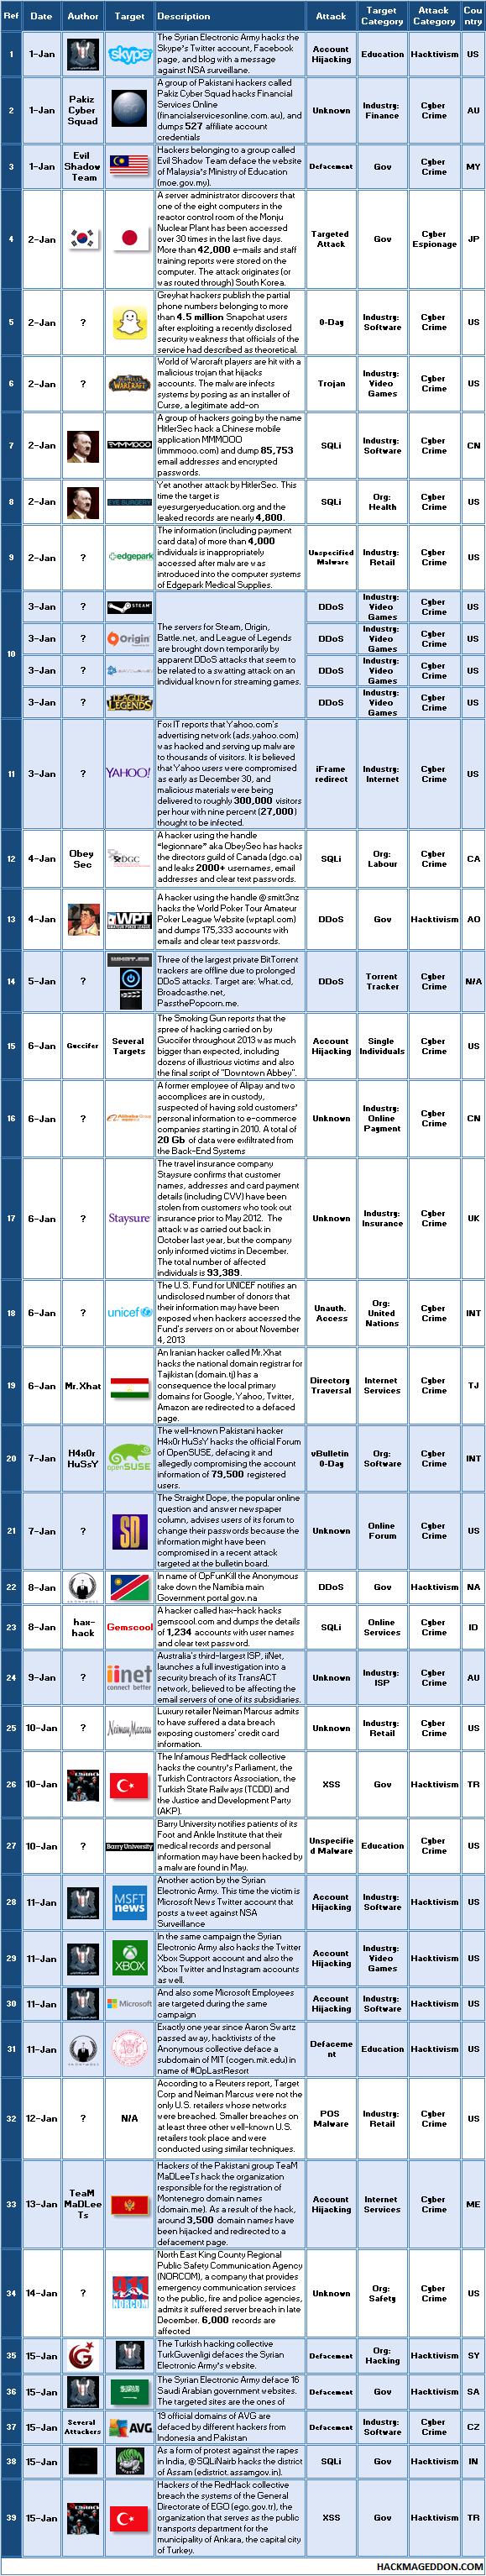 1-15 Jan 2014 Cyber Attacks Timeline